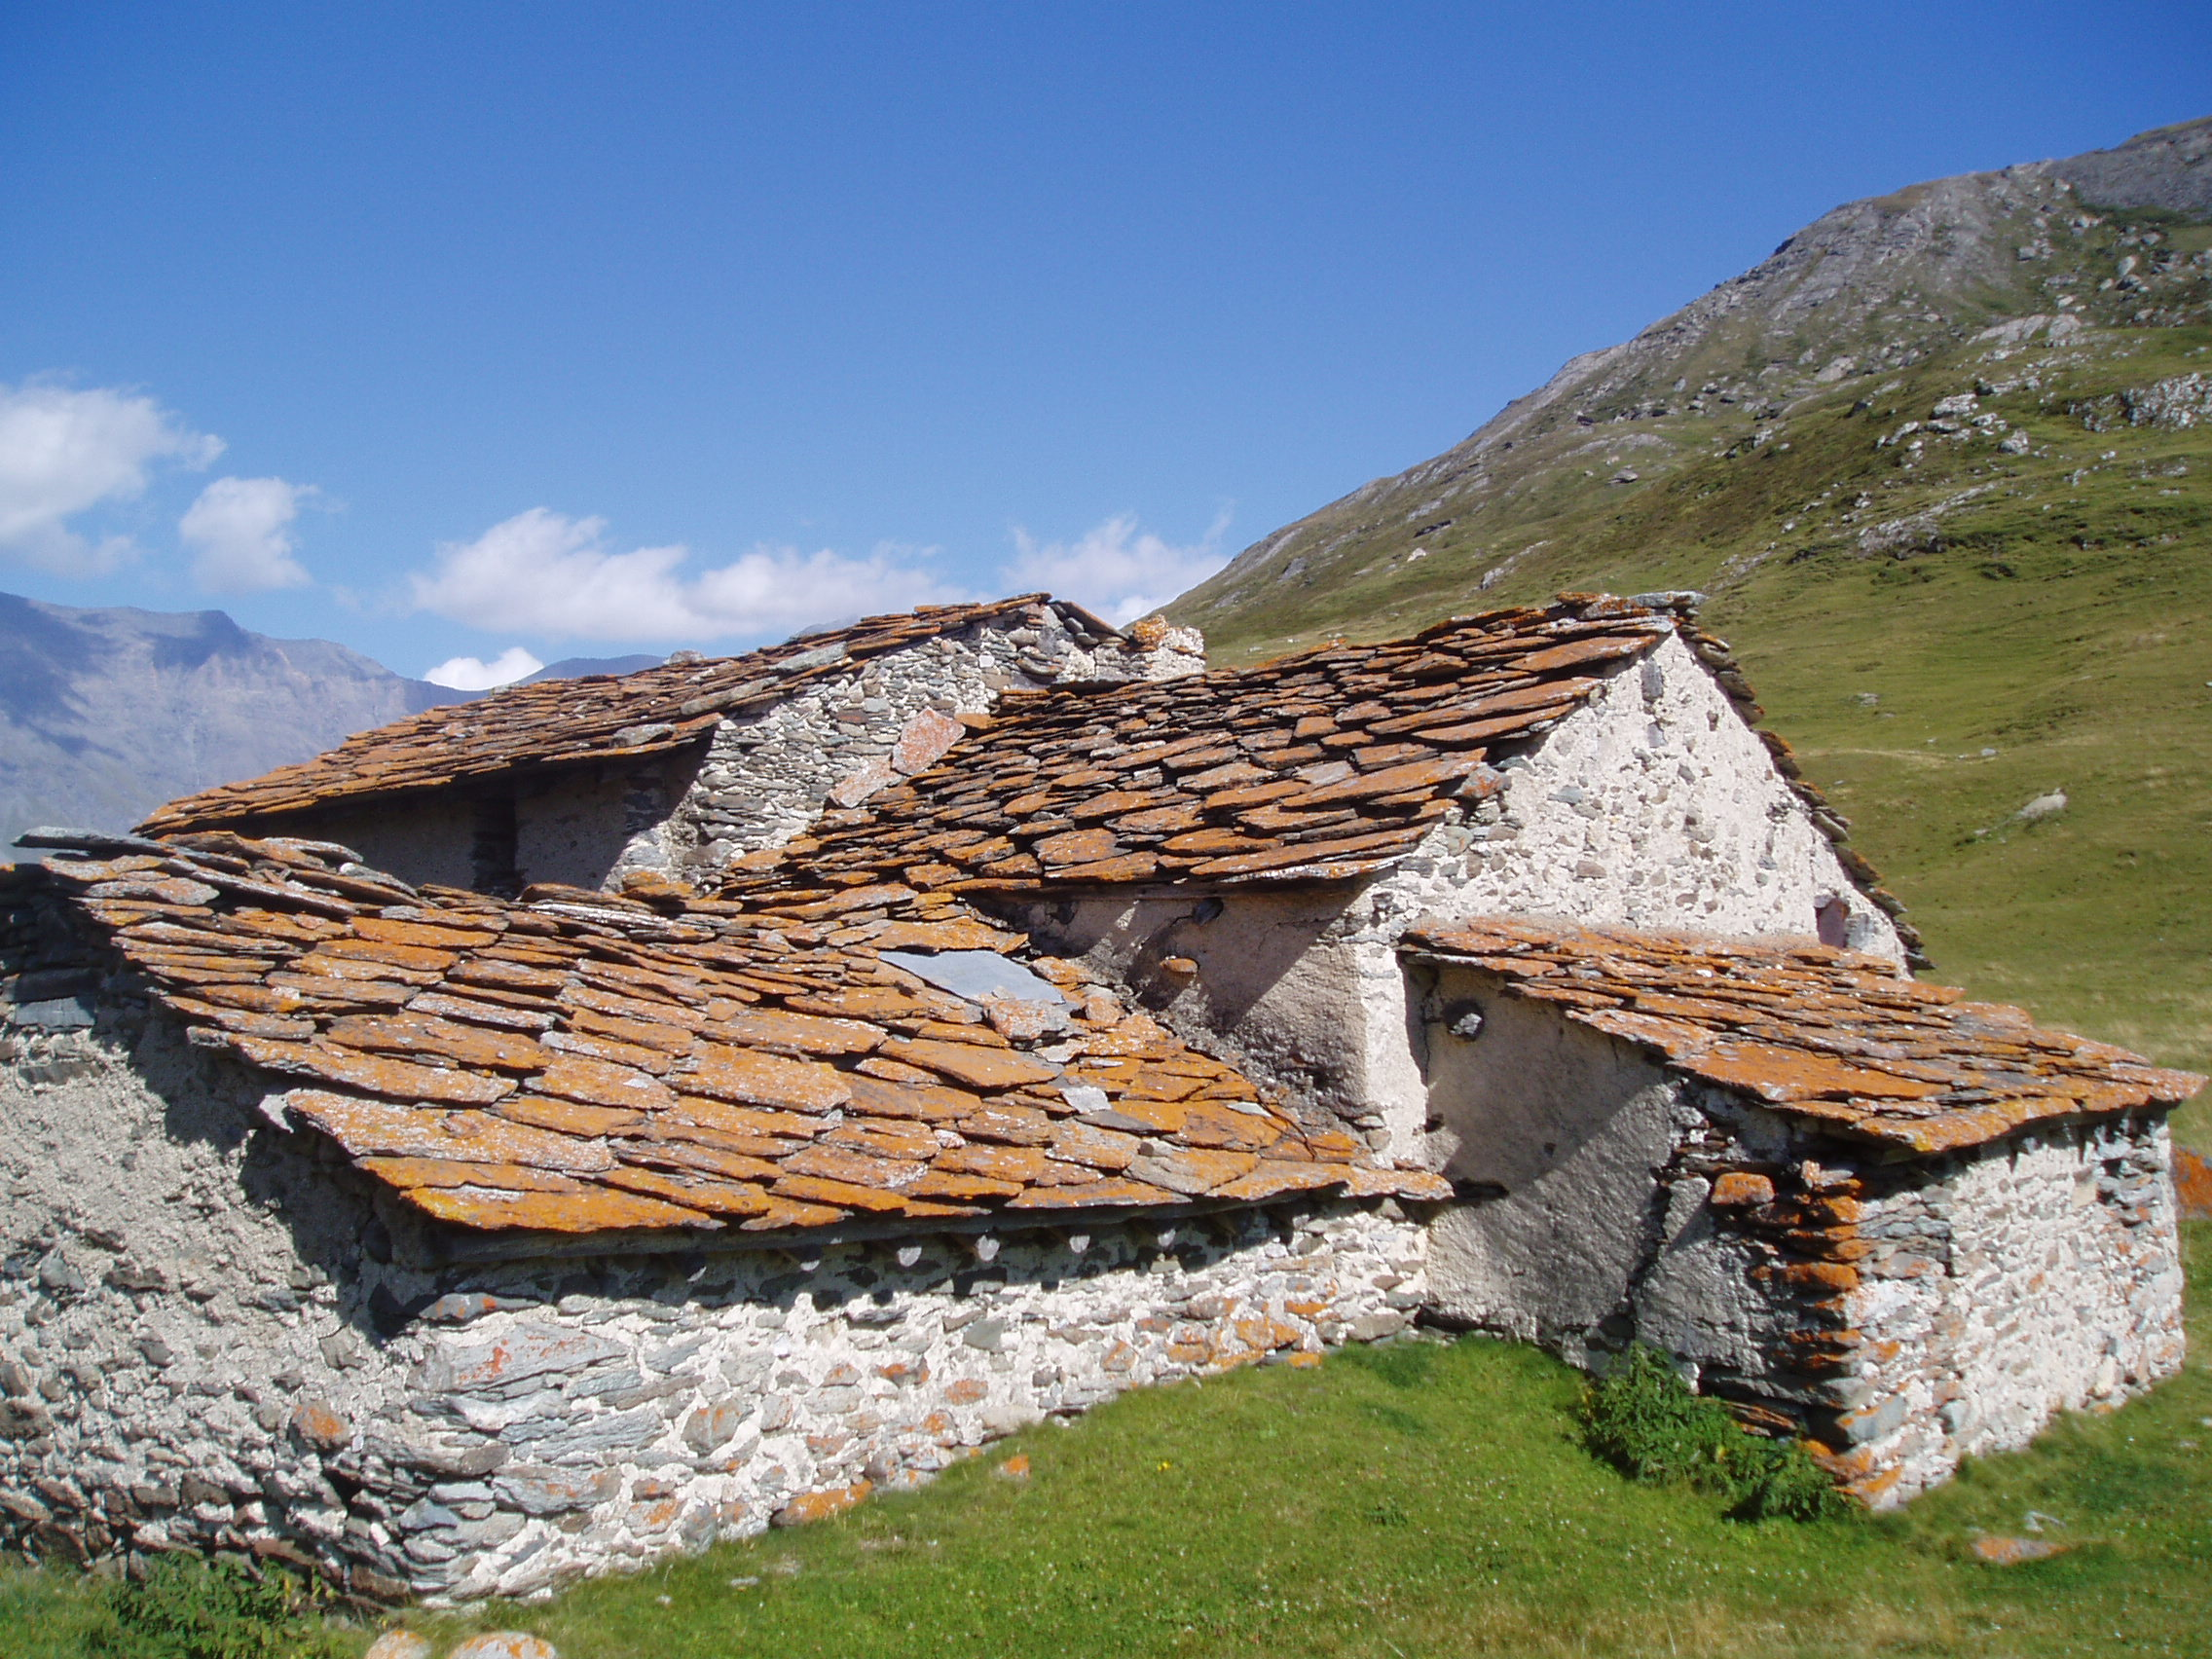 Mont Cenis, savalins © J.Jorcin-Roch, Fondation Facim